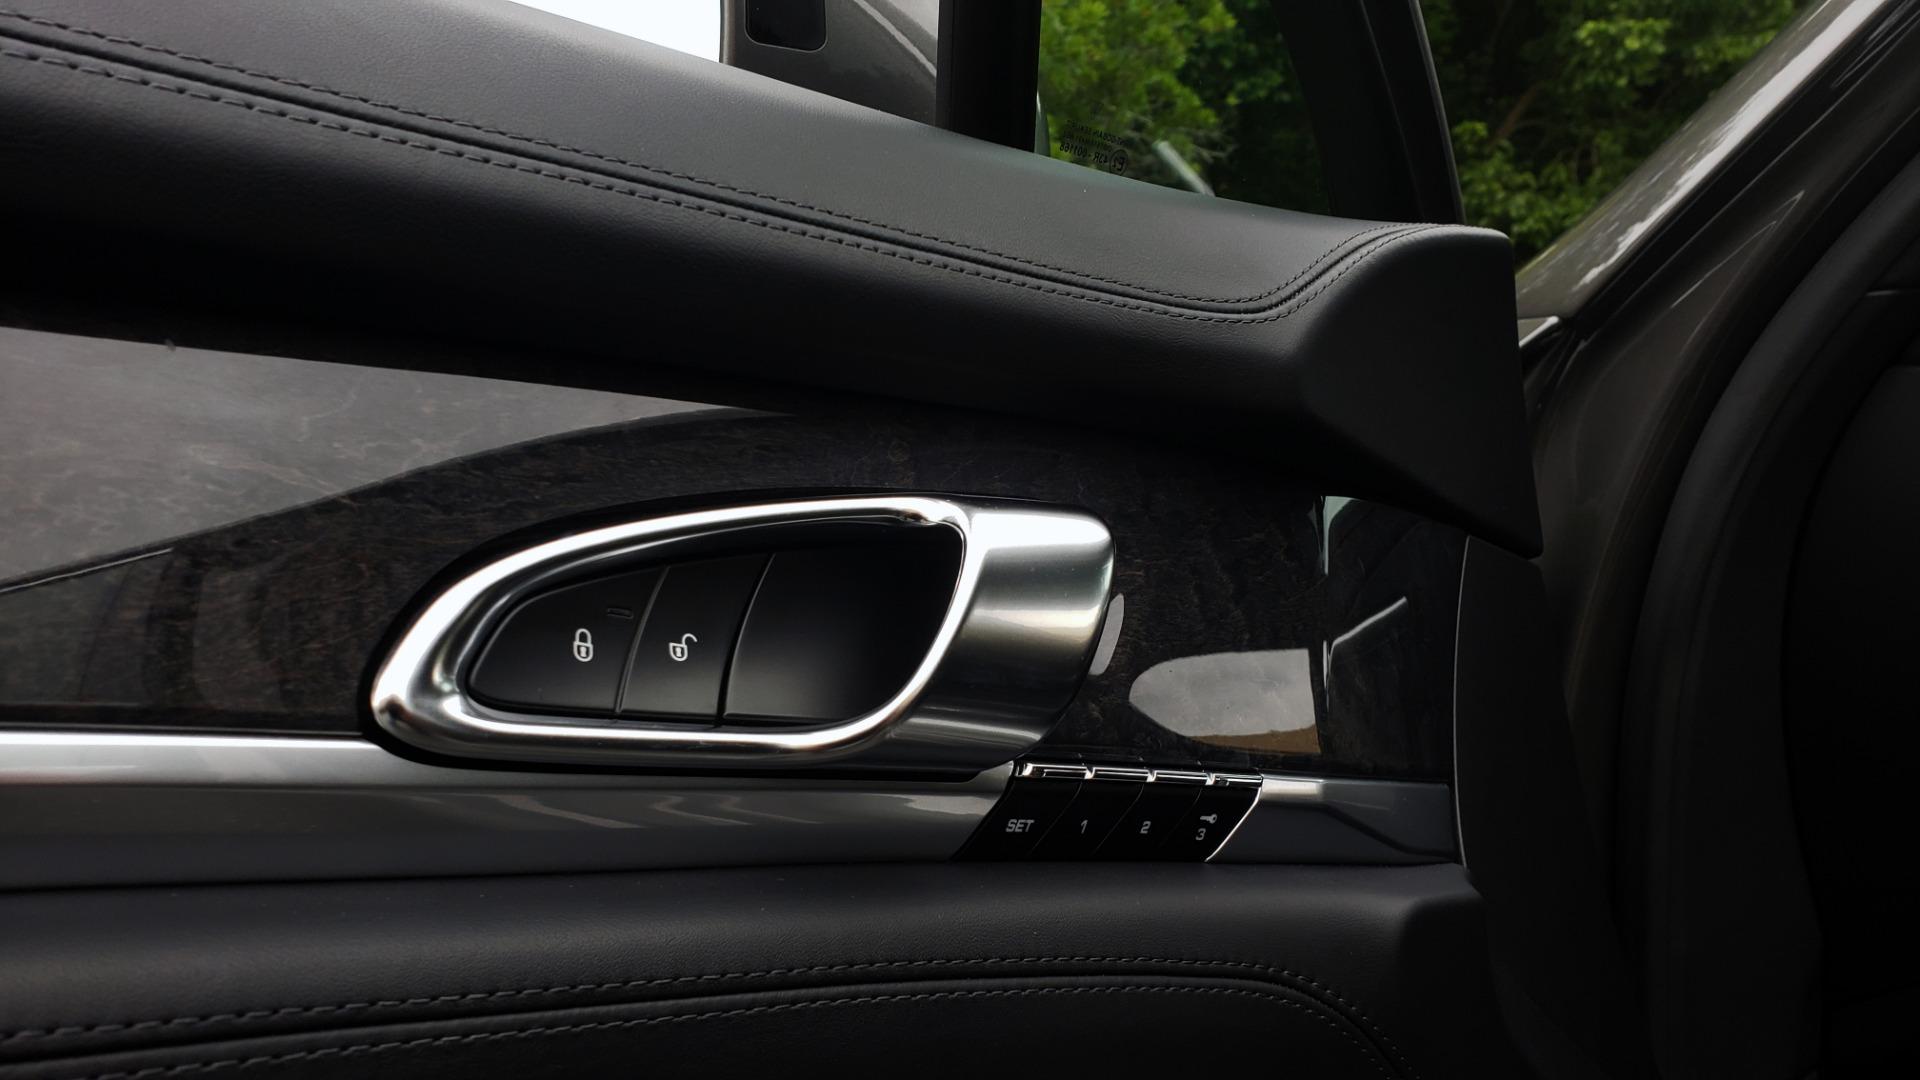 Used 2013 Porsche PANAMERA TURBO 4.8L V8 / AWD / NAV / SUNROOF / LCA / PARK ASST / BURMESTER for sale $45,995 at Formula Imports in Charlotte NC 28227 30